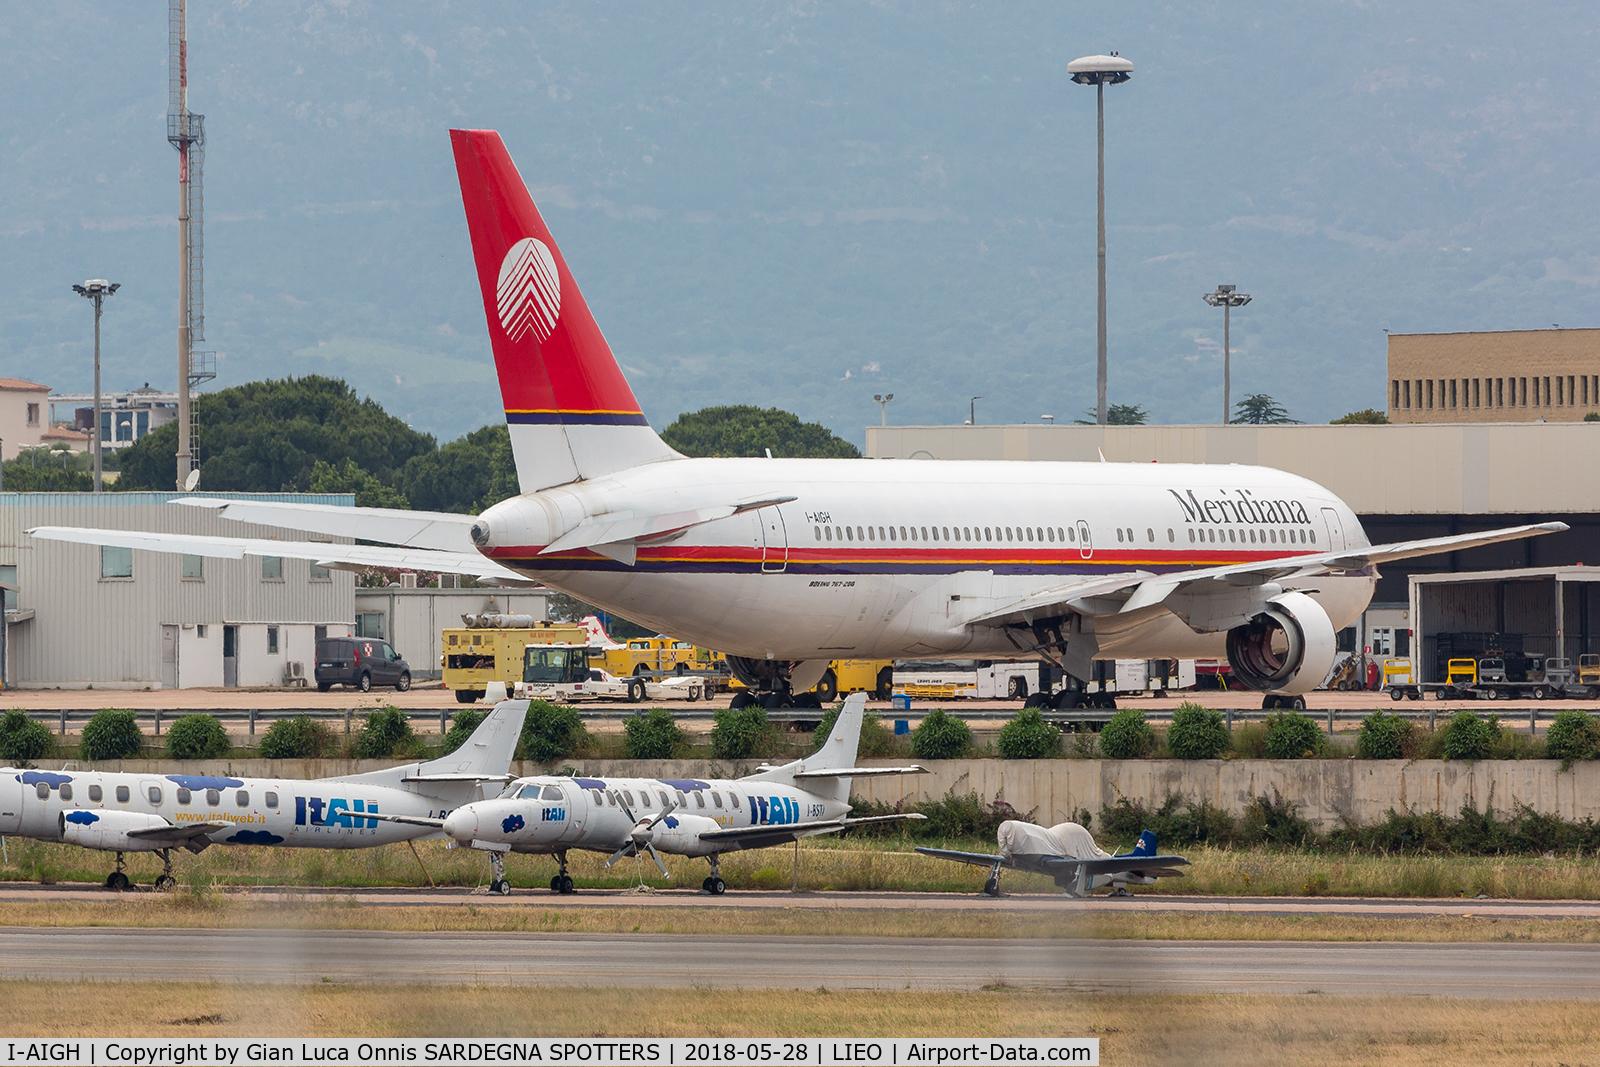 I-AIGH, 1988 Boeing 767-23B/ER C/N 23973, IN PARKING